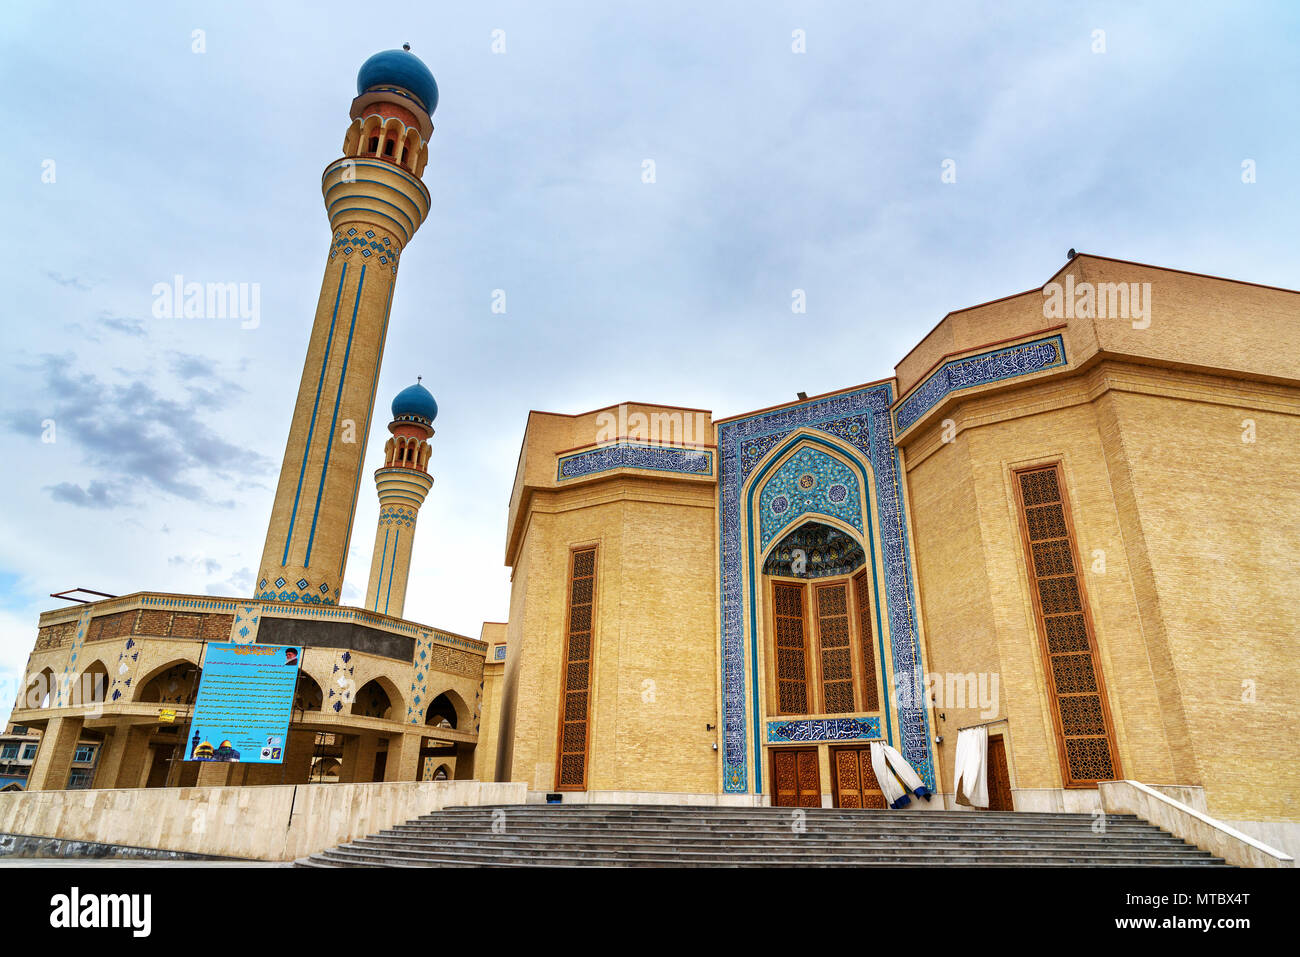 Tabriz, East Azerbaijan province, Iran - March 15 2018 Musalla mosque - Stock Image